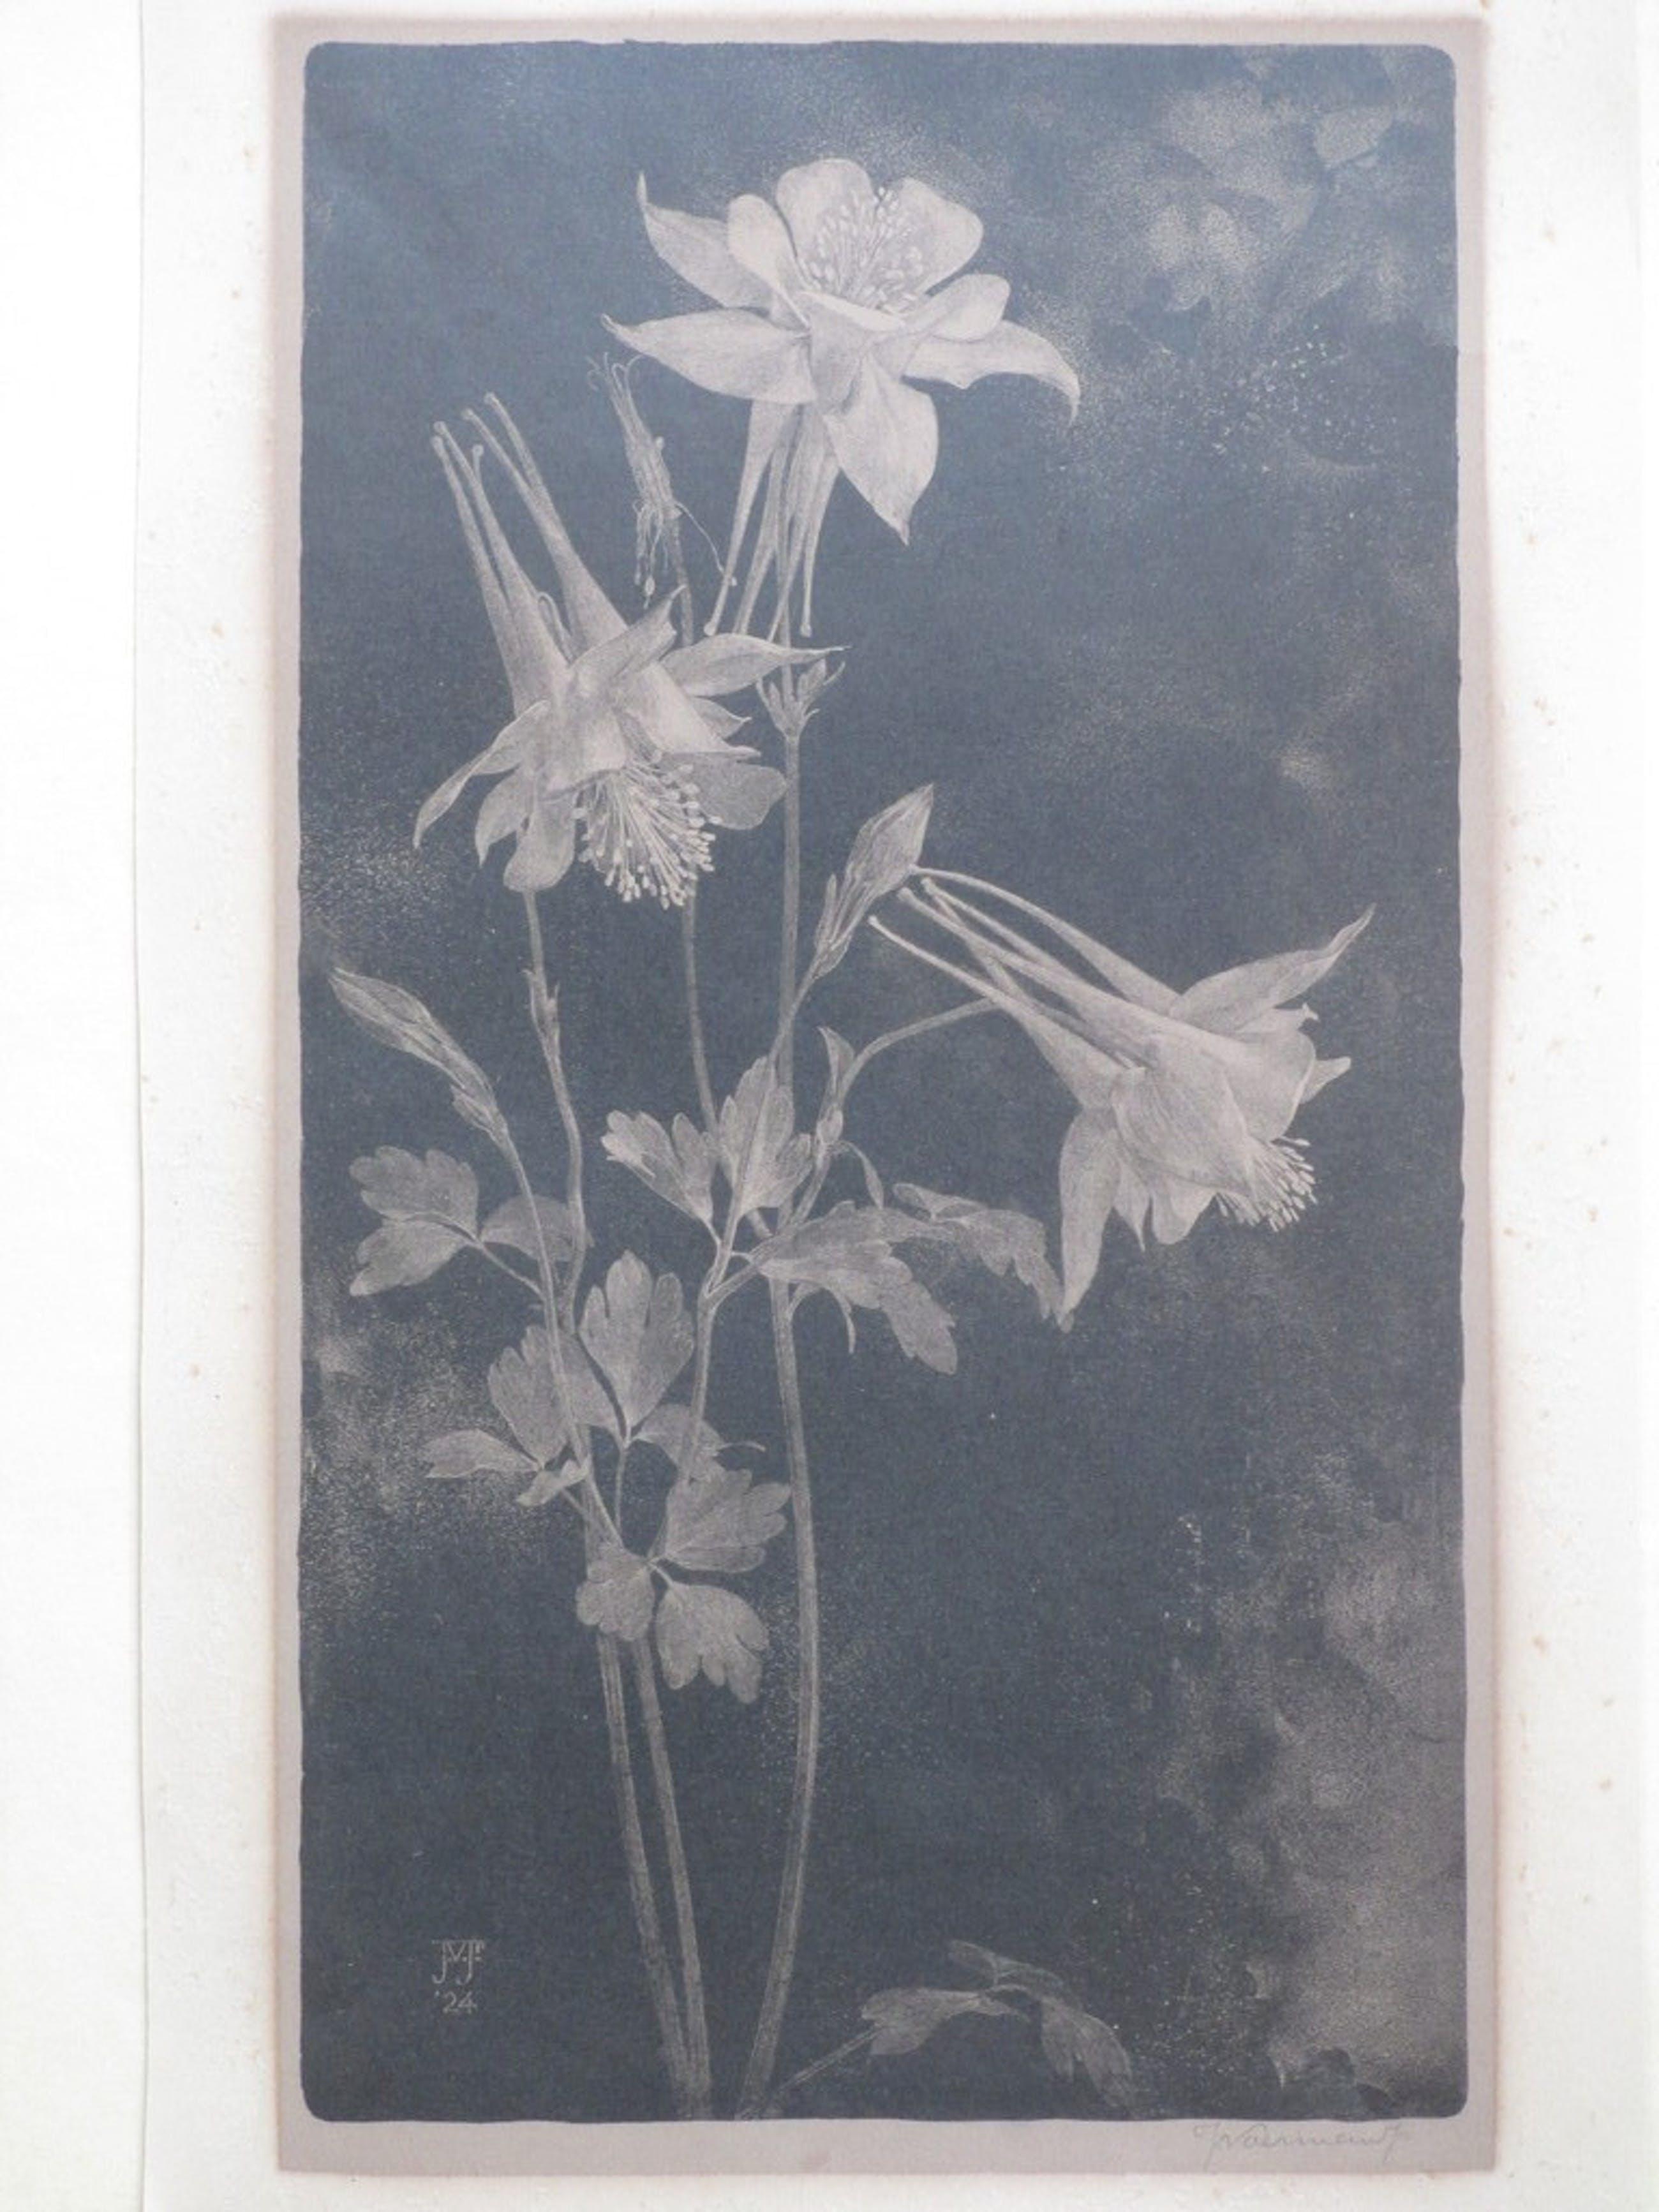 Jan Voerman Jr., Bloeiende bloemen, Litho 1924 kopen? Bied vanaf 35!